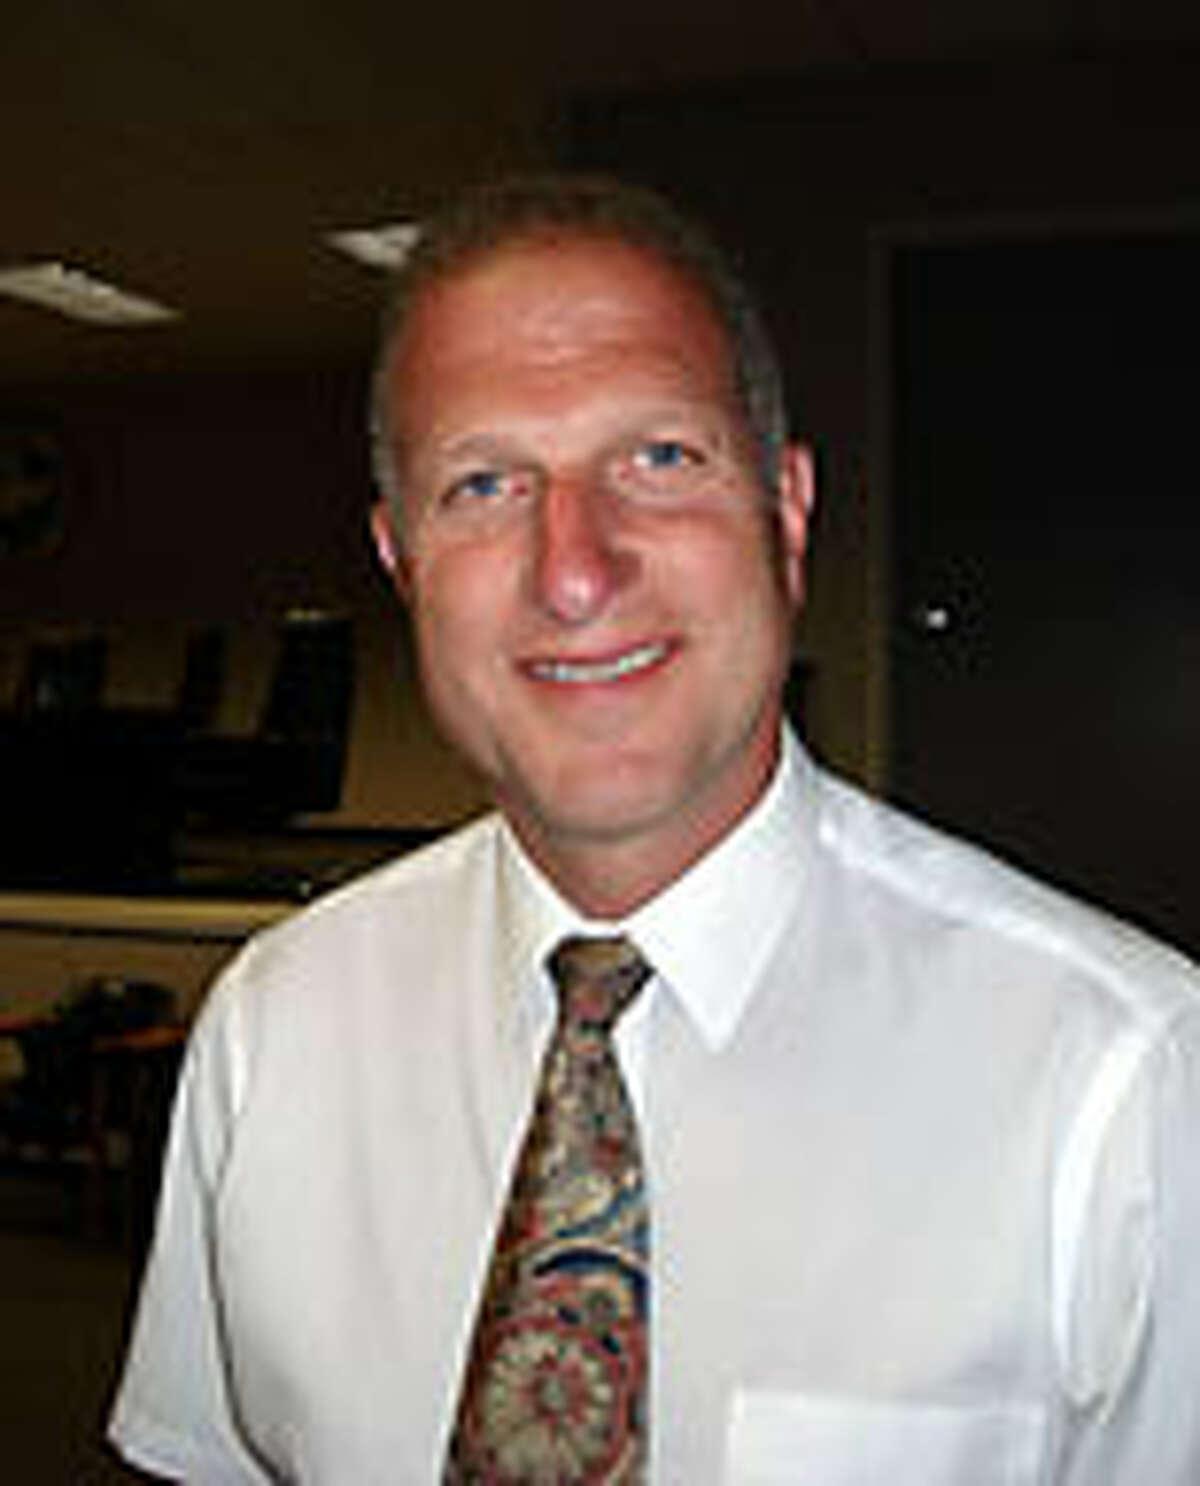 Mayor Mark Lauretti